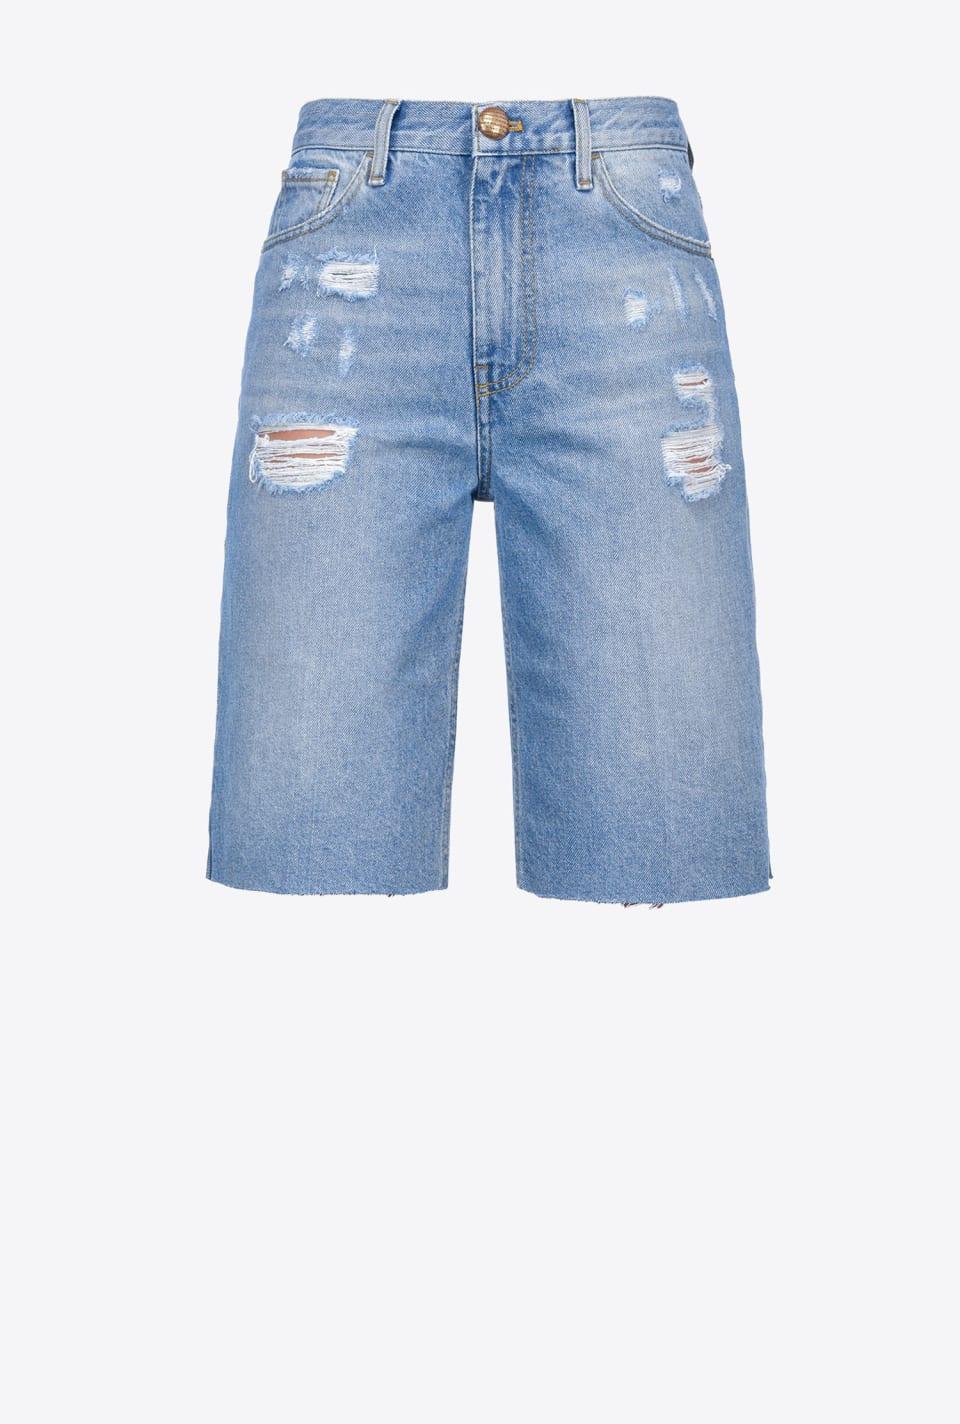 Vintage denim Bermuda shorts - Pinko